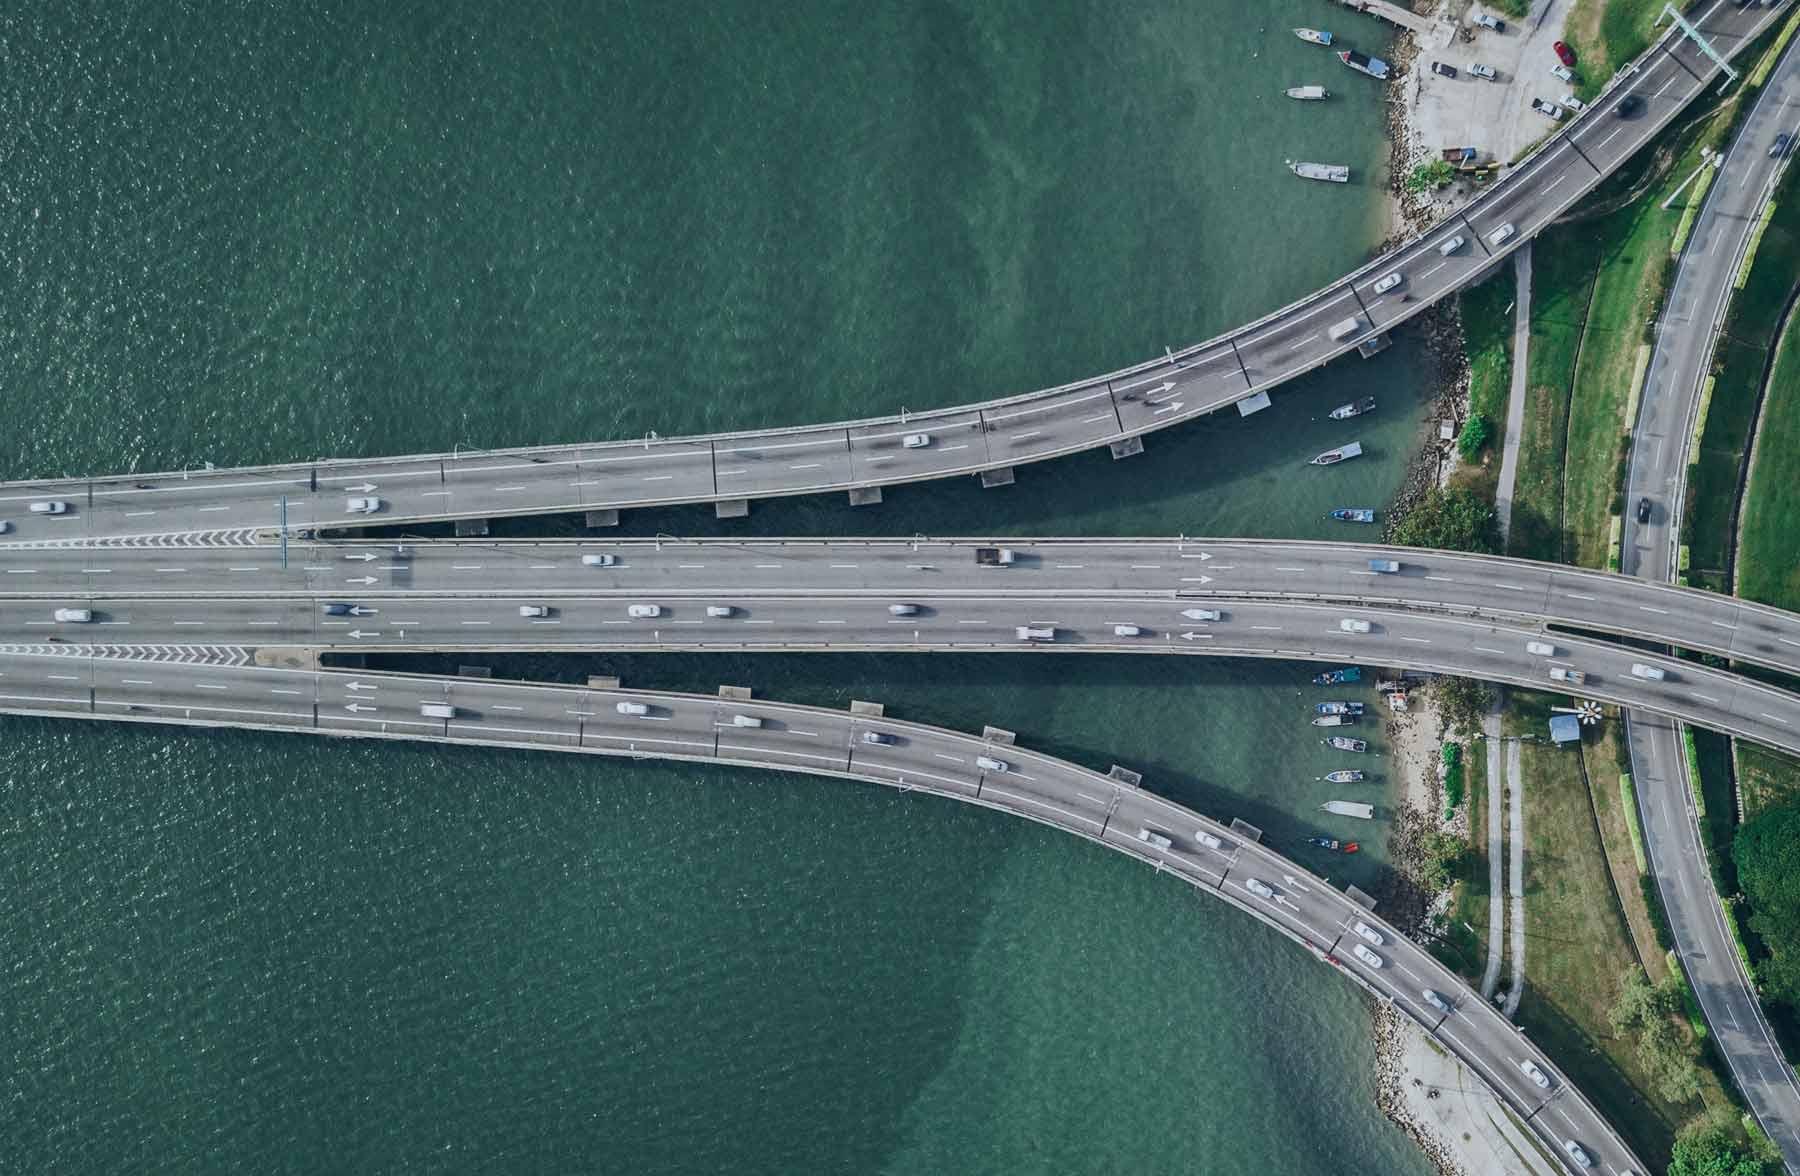 Vehicle Leasing & Fleet Management